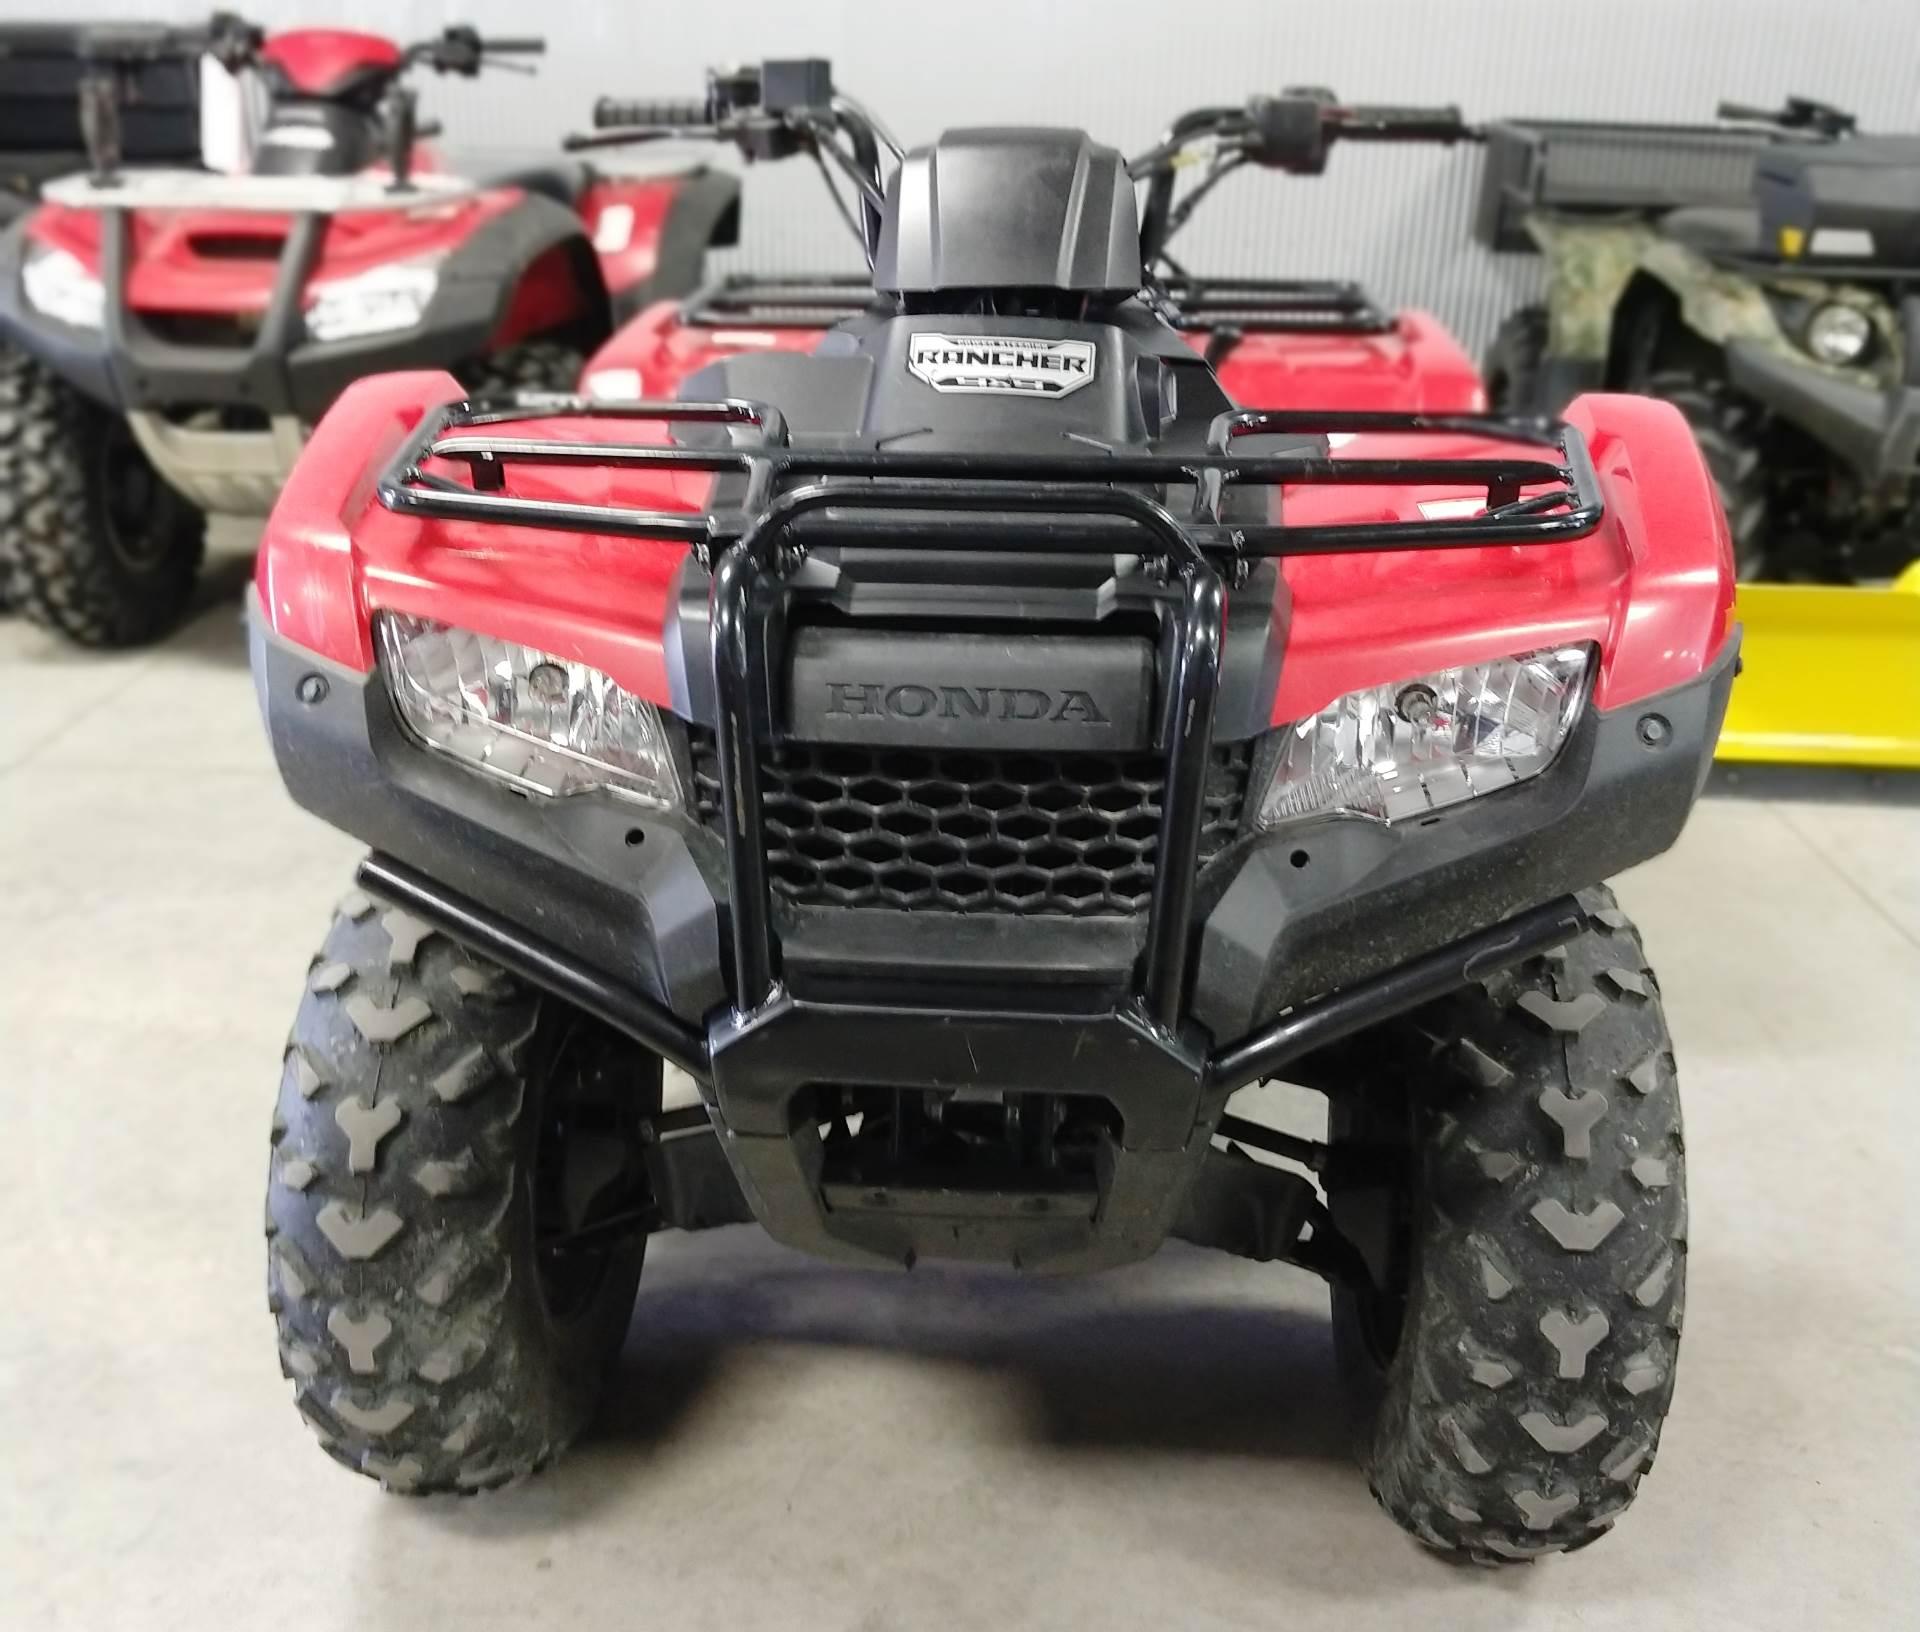 2016 Honda FourTrax Rancher 4x4 Power Steering in Ottumwa, Iowa